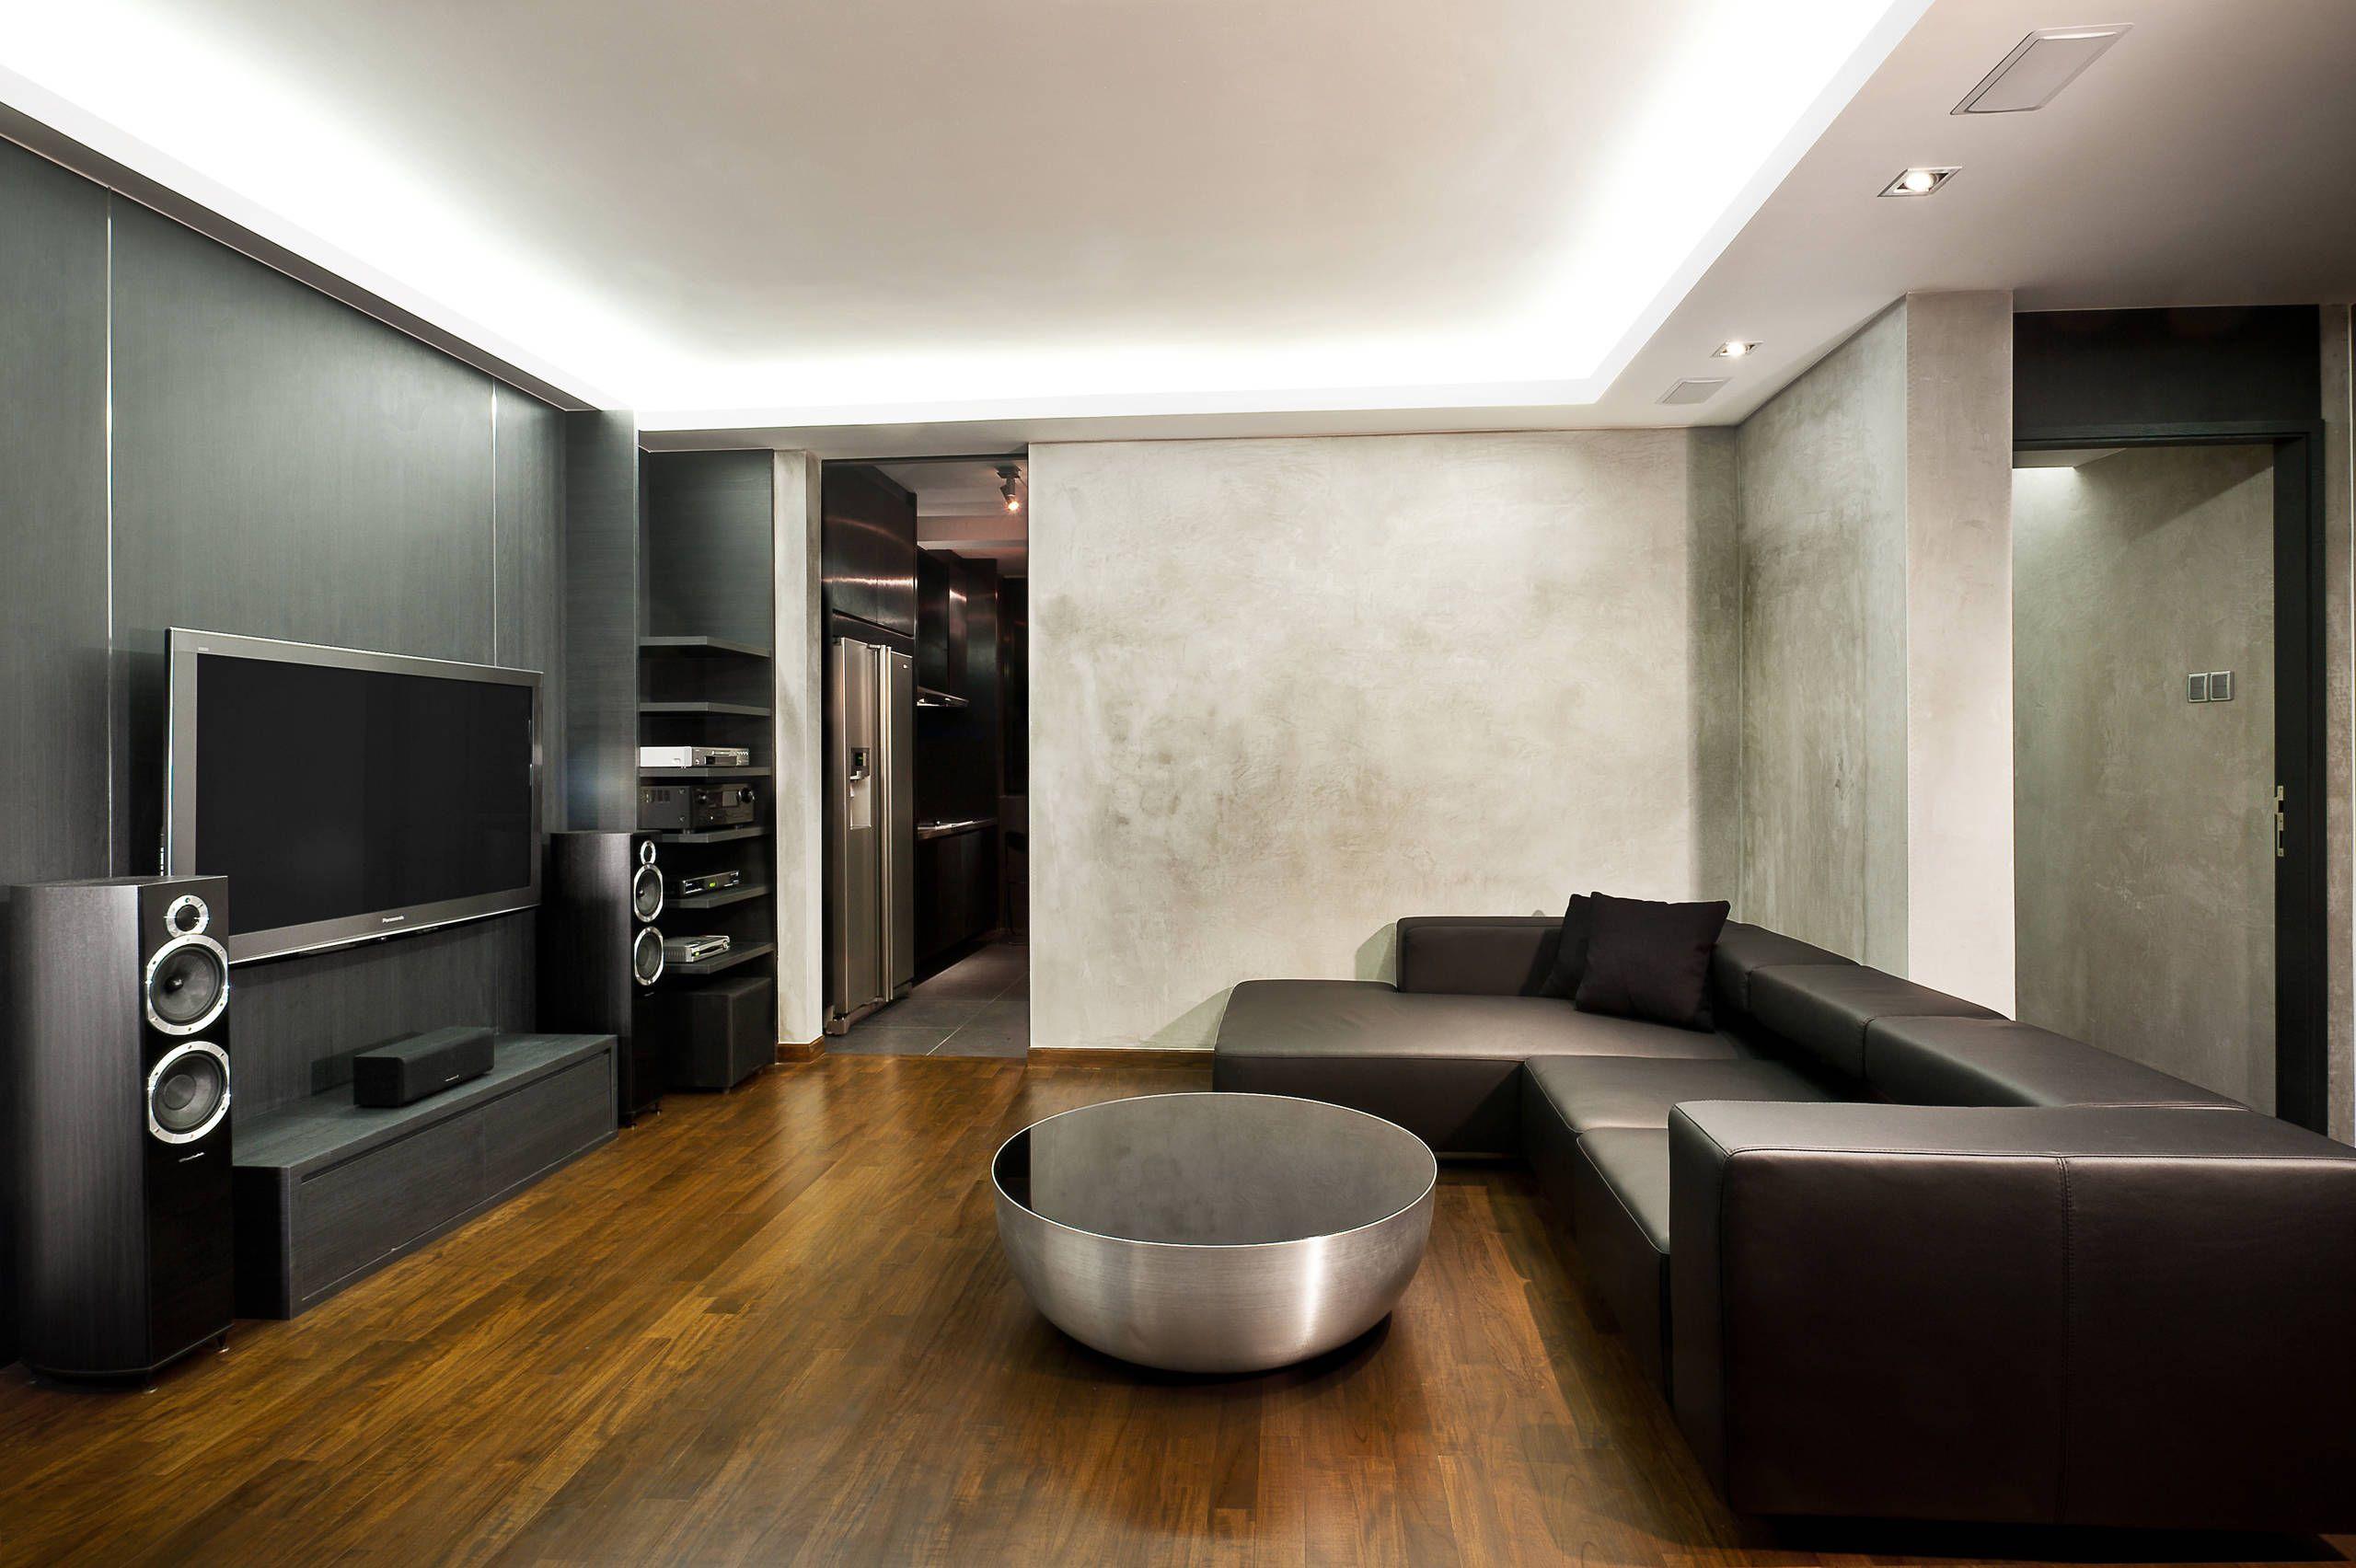 Tv Media Room Cove Lighting Google Search Masculine Interior Design Minimalist House Design Interior Design